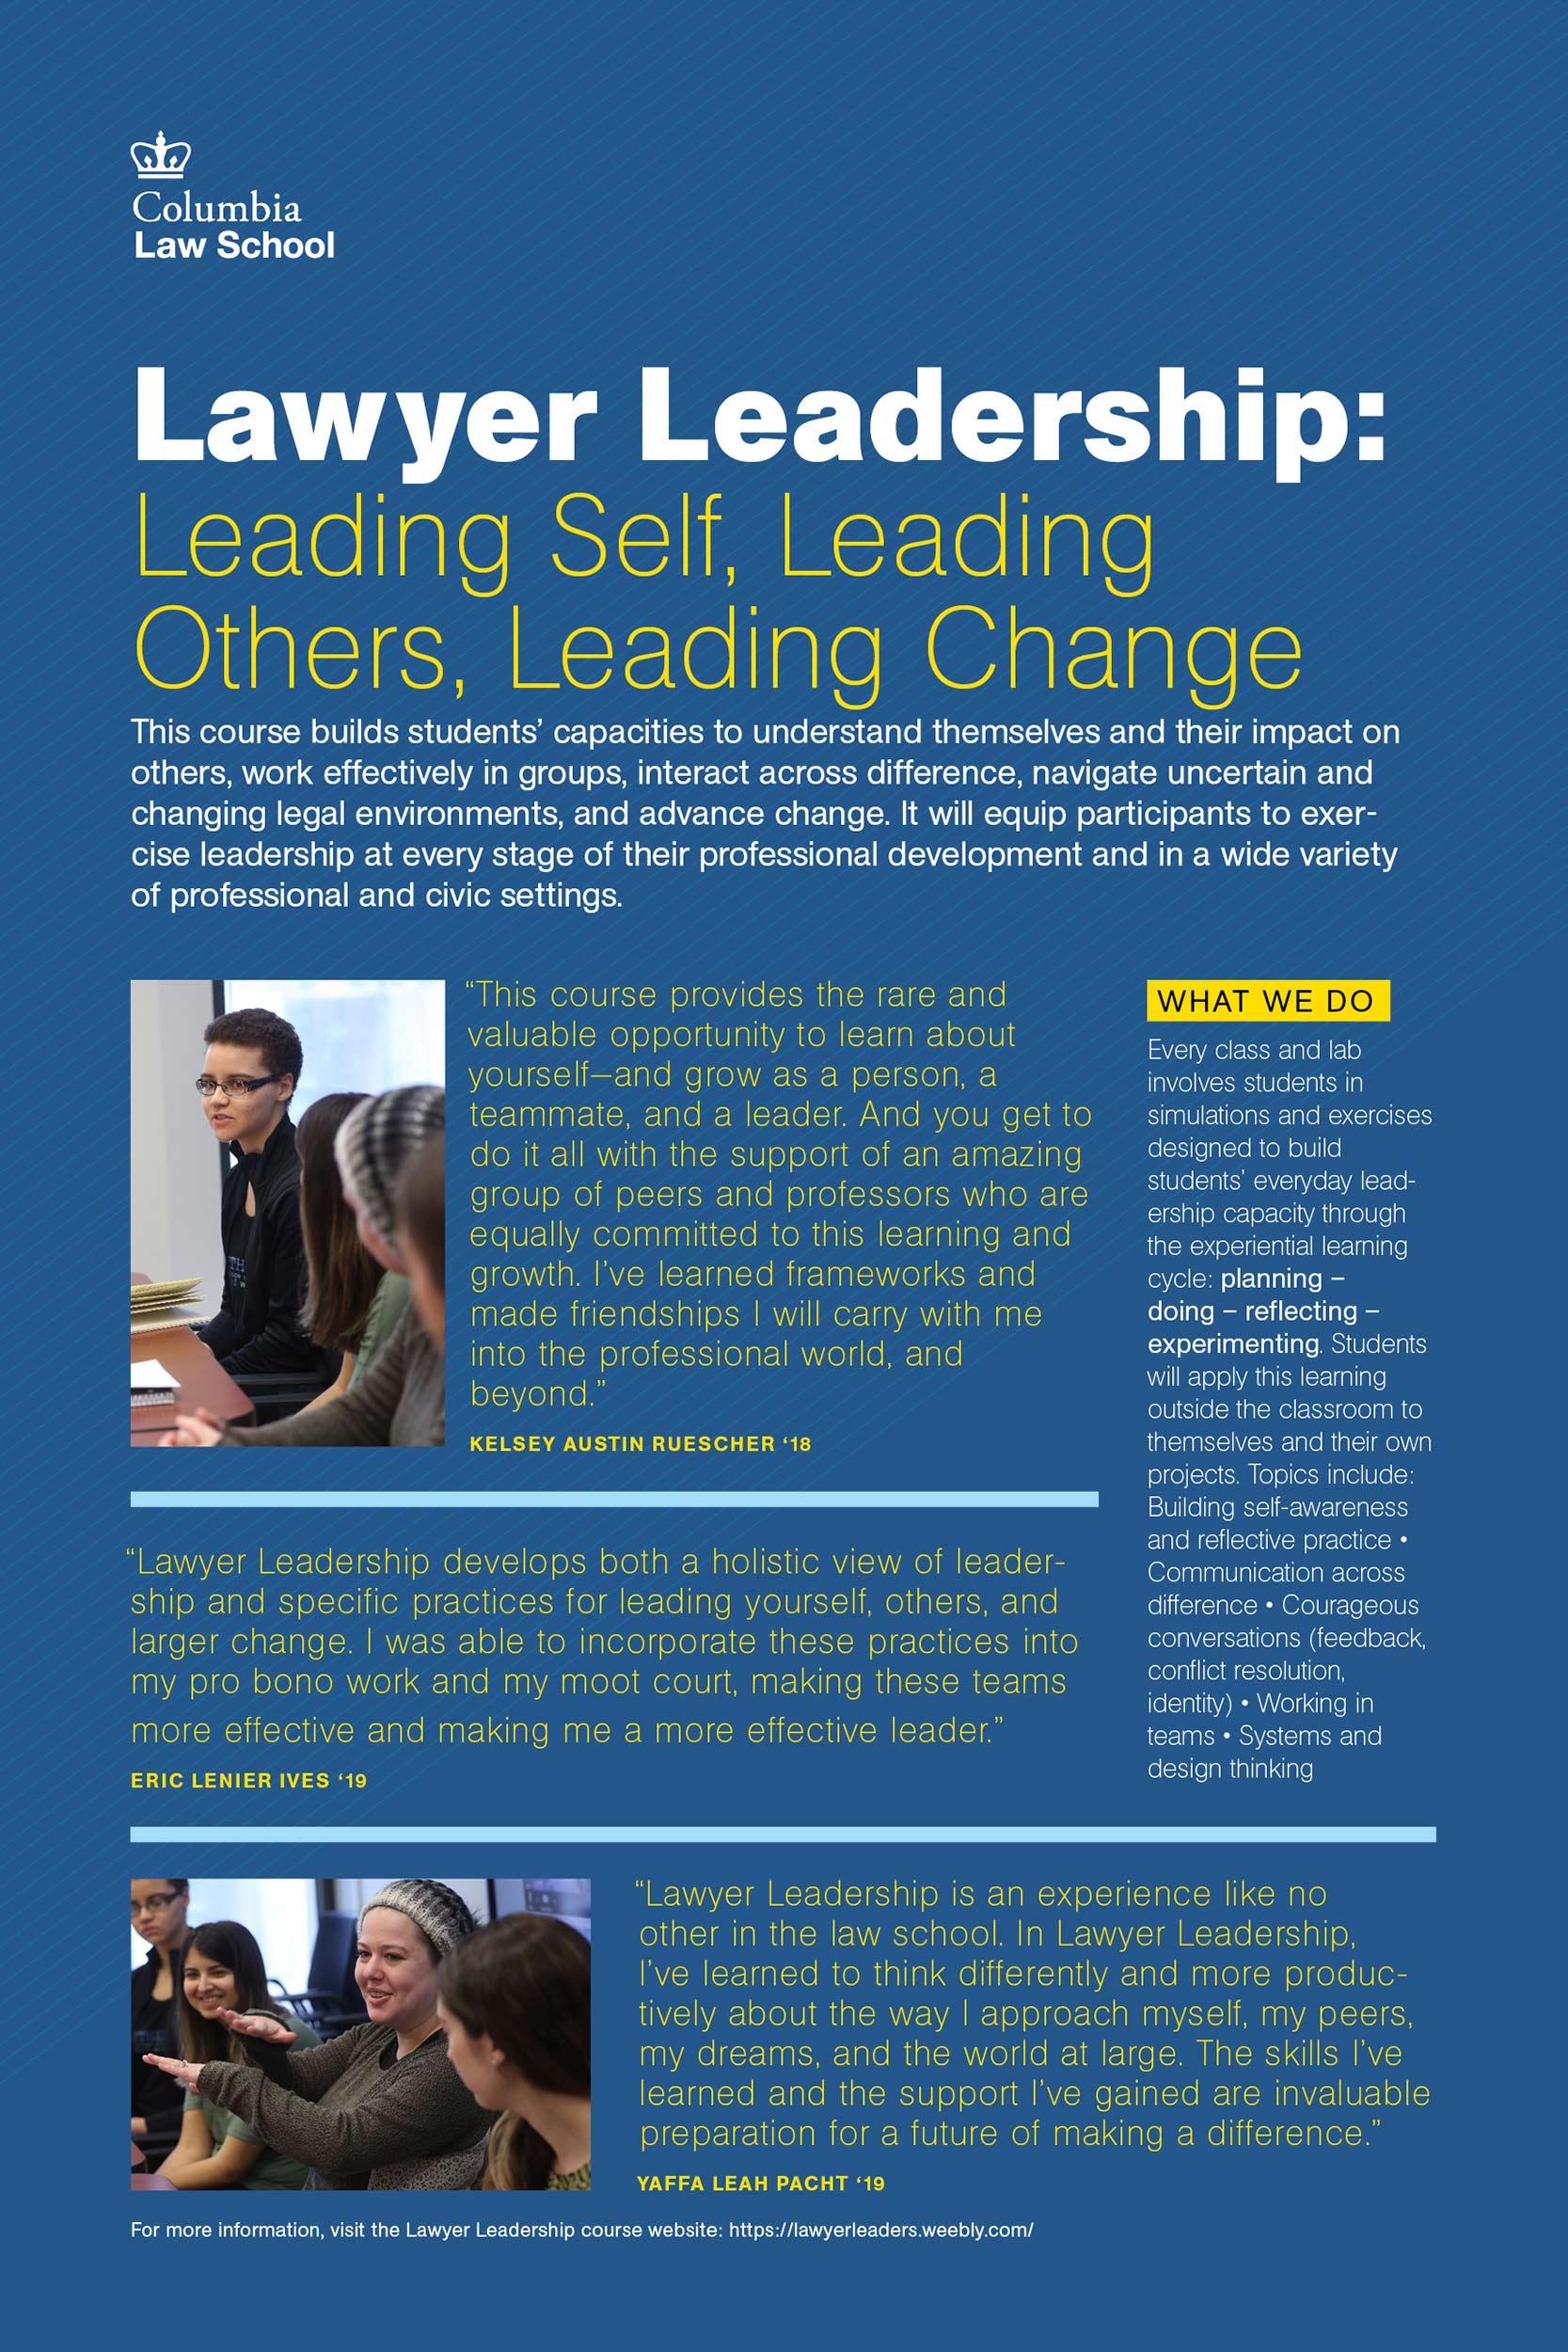 Lawyer-Leadership-Poster-4Web.jpg